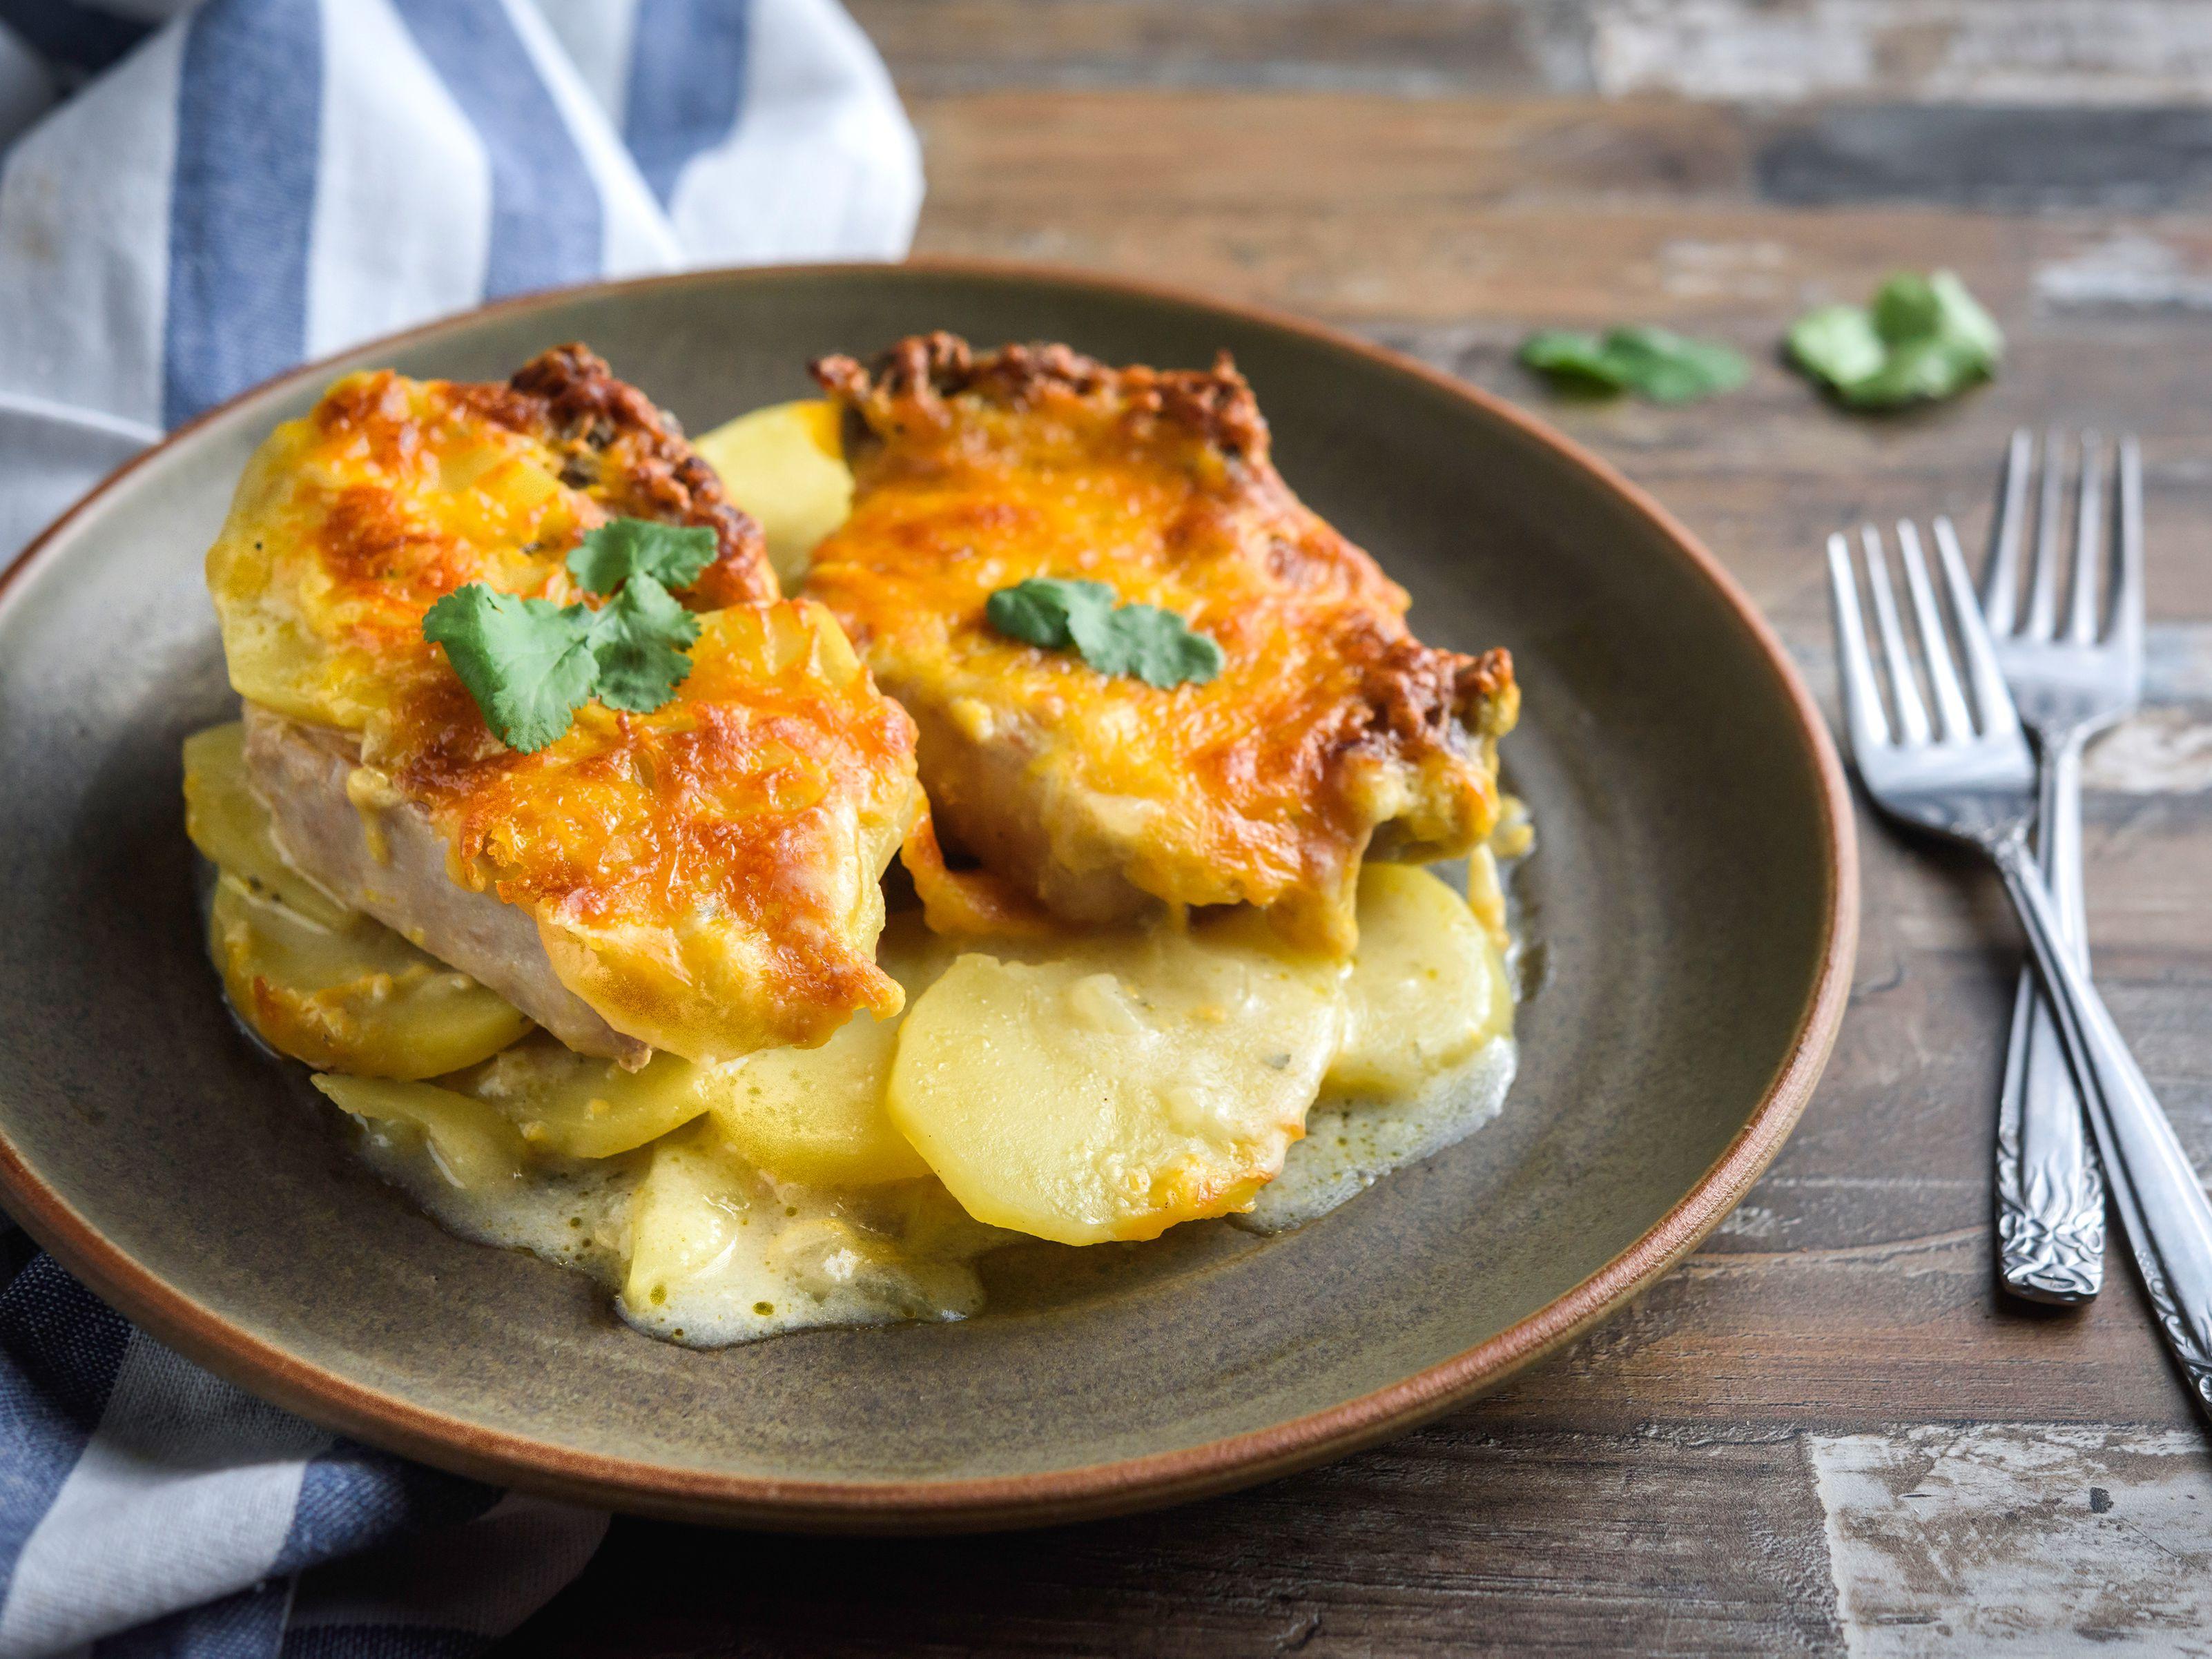 pork chop casserole recipe ideas Easy Pork Chop Casserole With Cheese and Potatoes